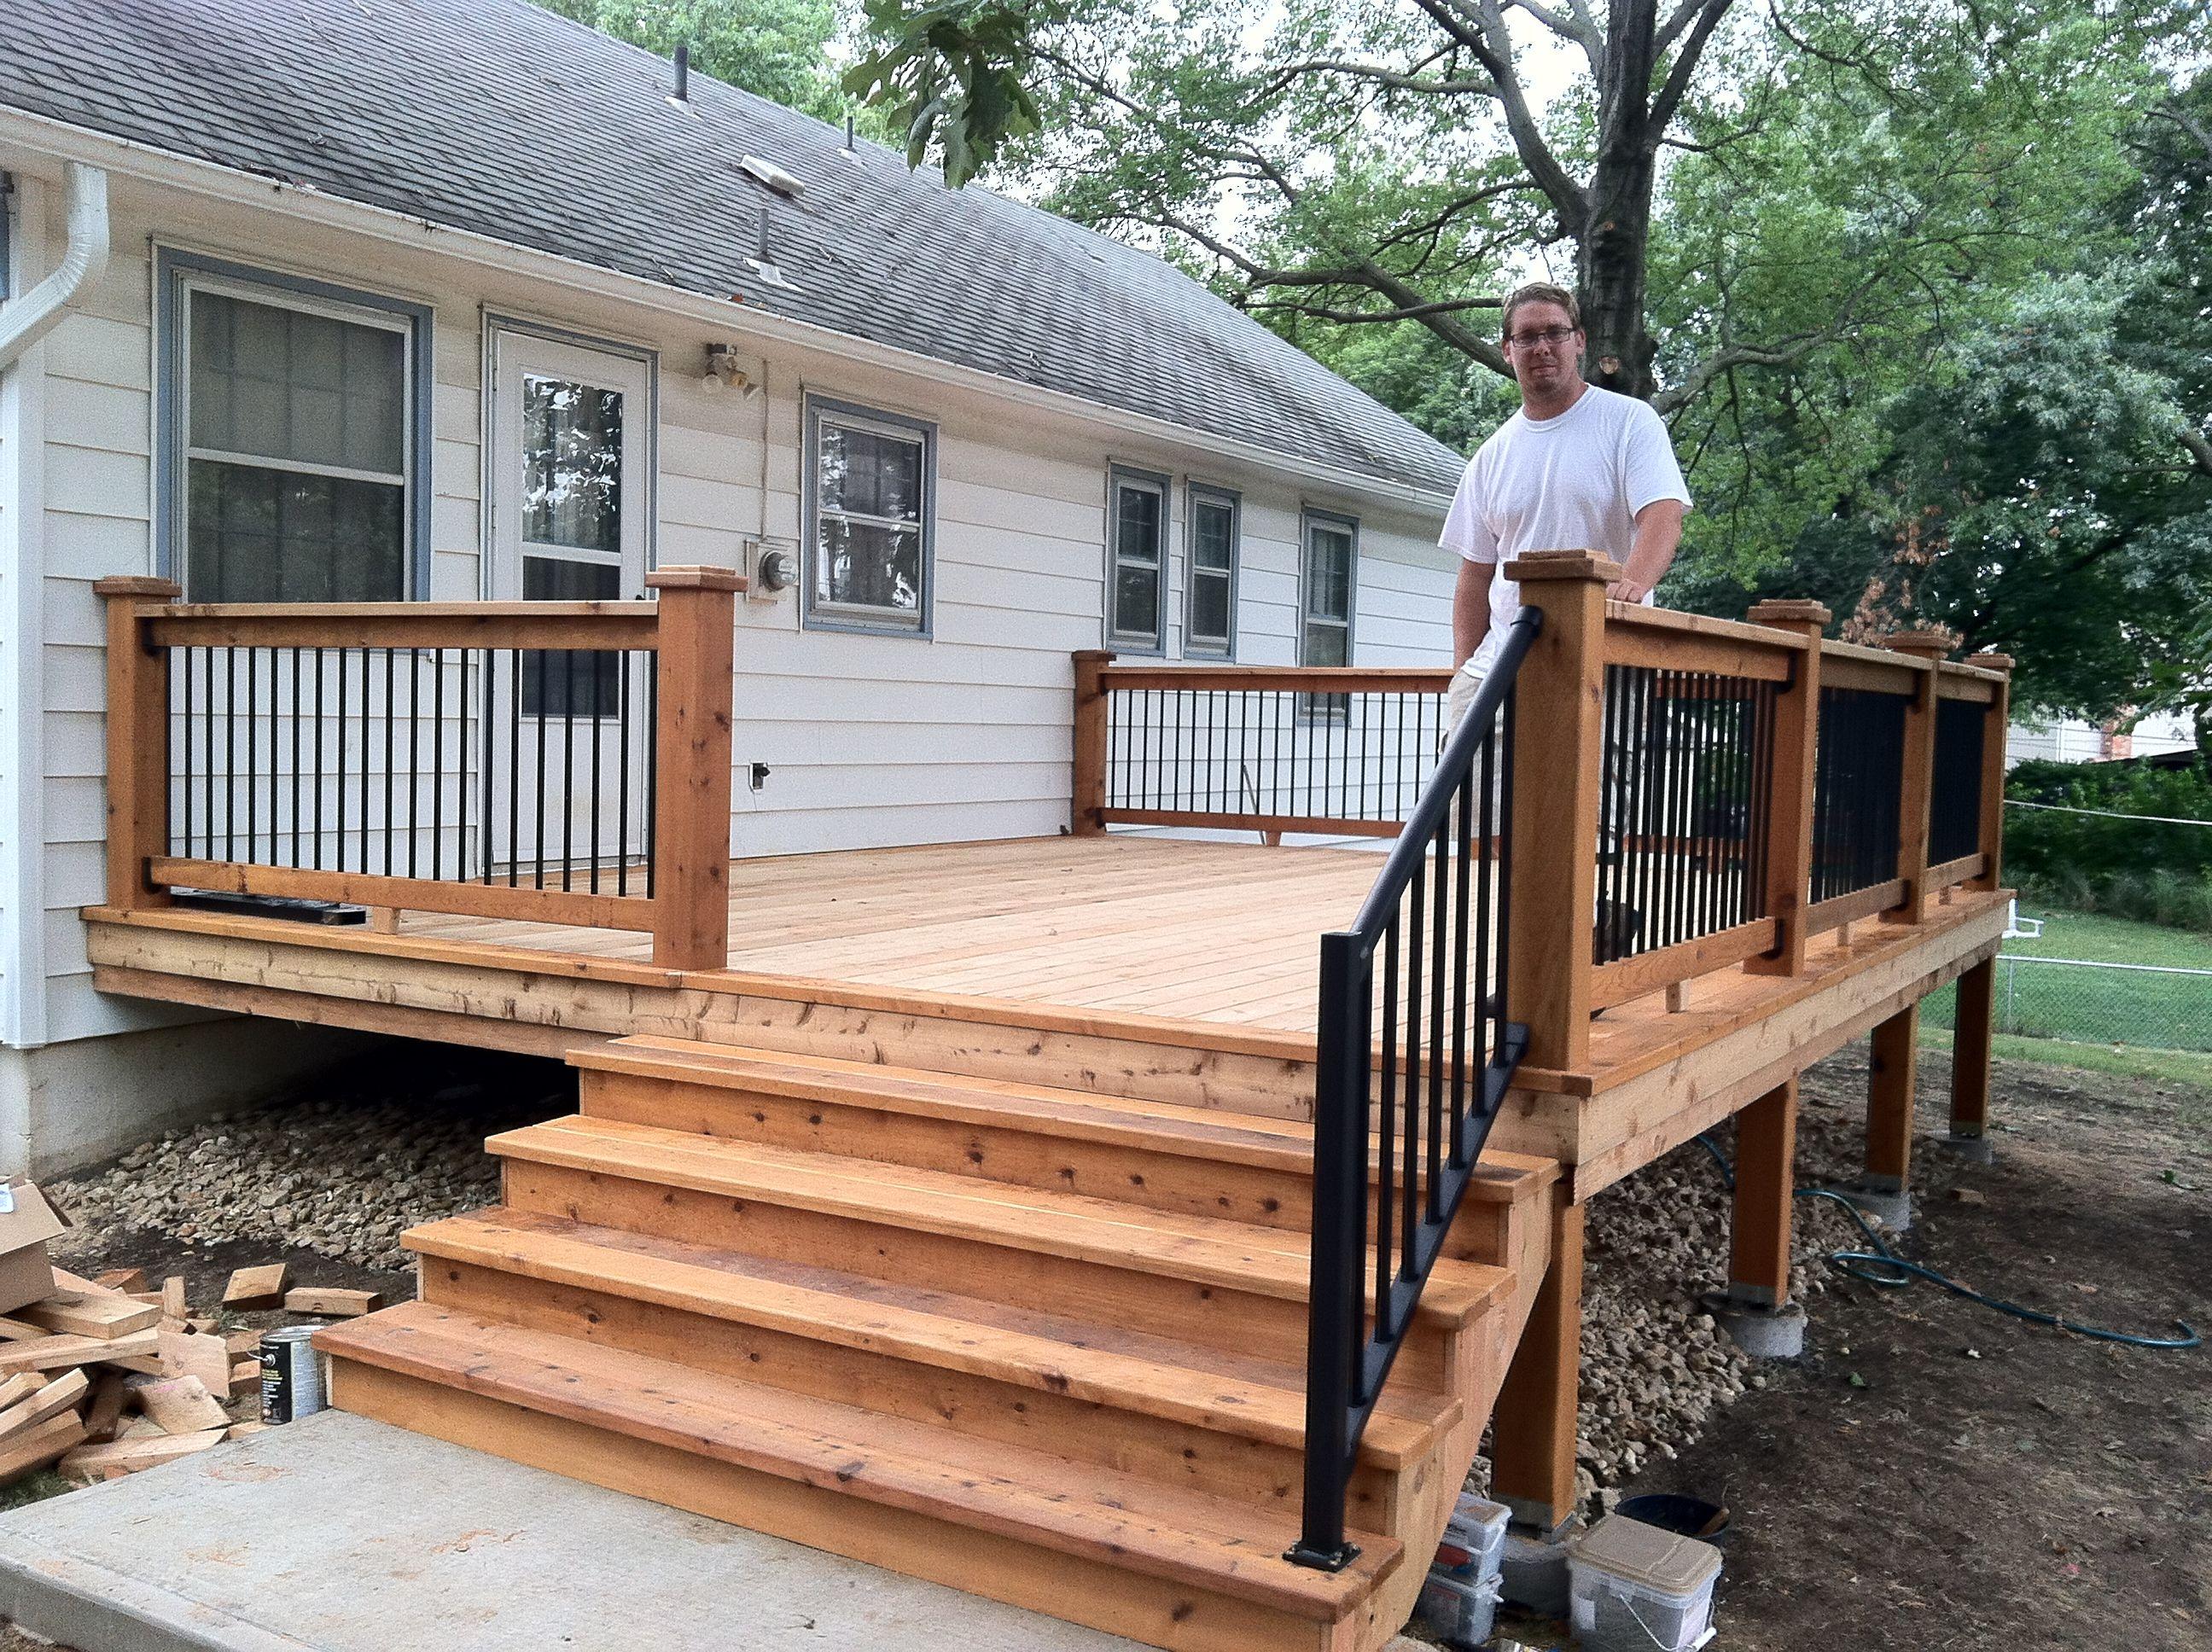 A Small Back Deck Deck Designs Backyard Patio Deck Designs